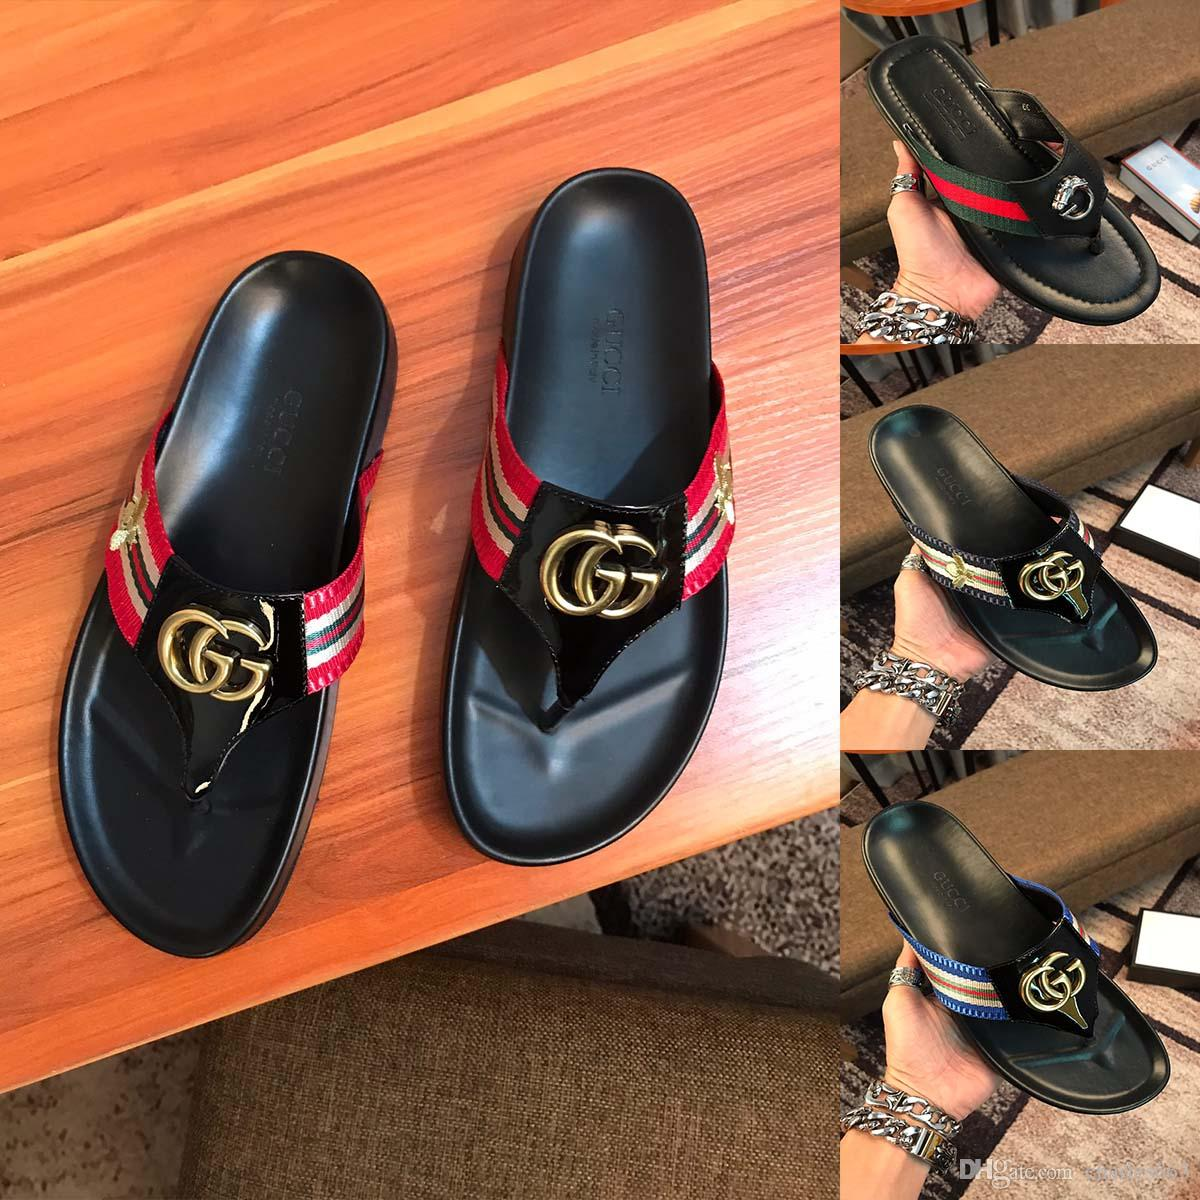 3ad7b0a064b5 Comfort Sandals Summer Men Beach Flip Flops Shoes Sandals Open Toe Slipper  Indoor Outdoor Flip Flops 38 45 Male Shoes Mens Shoes Combat Boots From ...